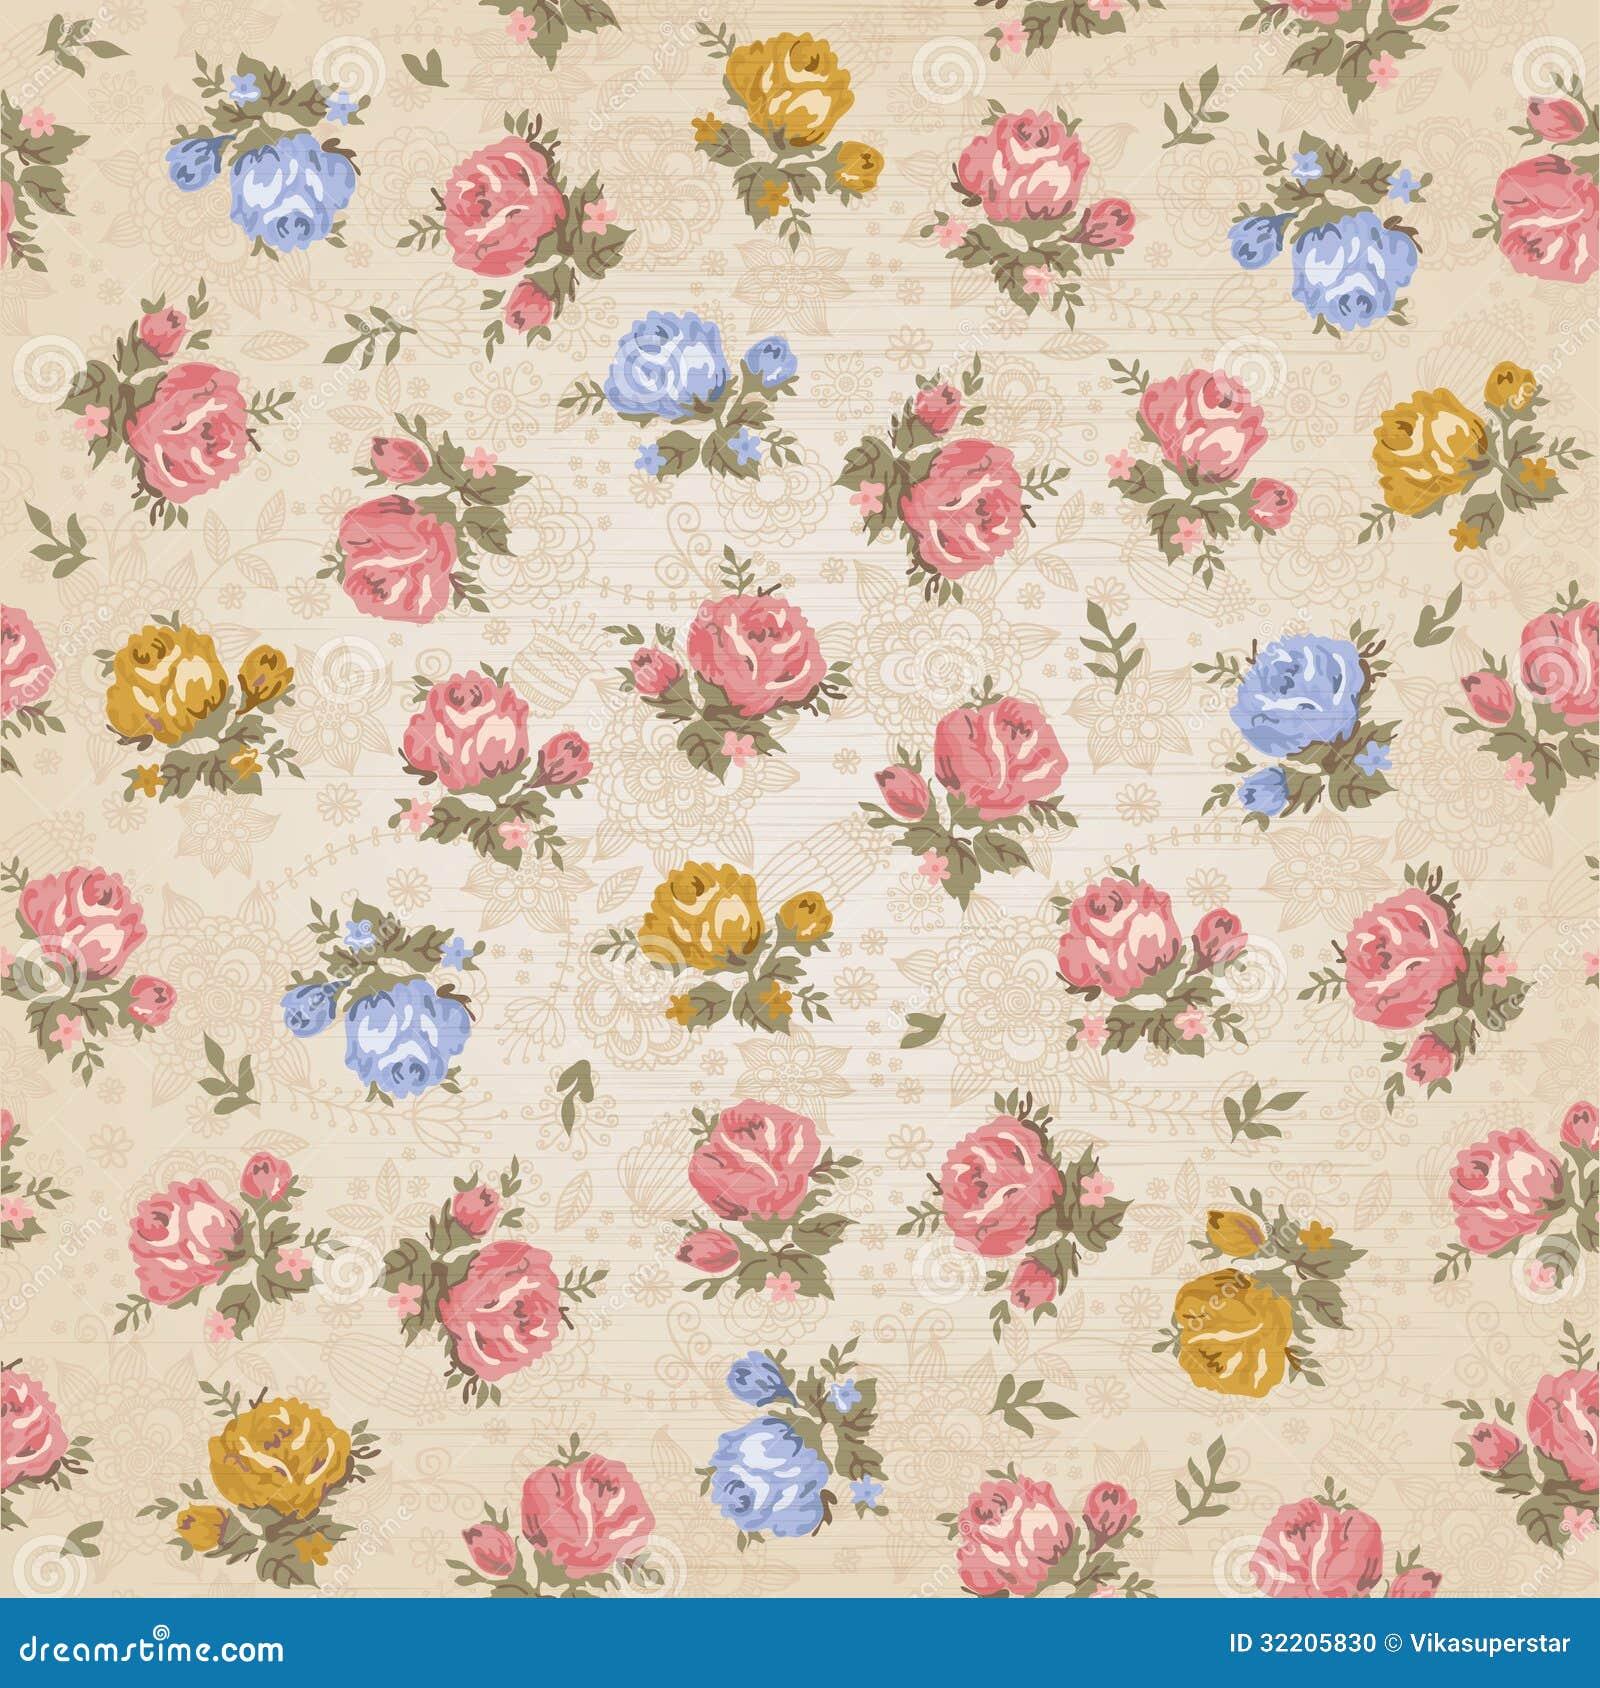 Gold color flower wallpaper